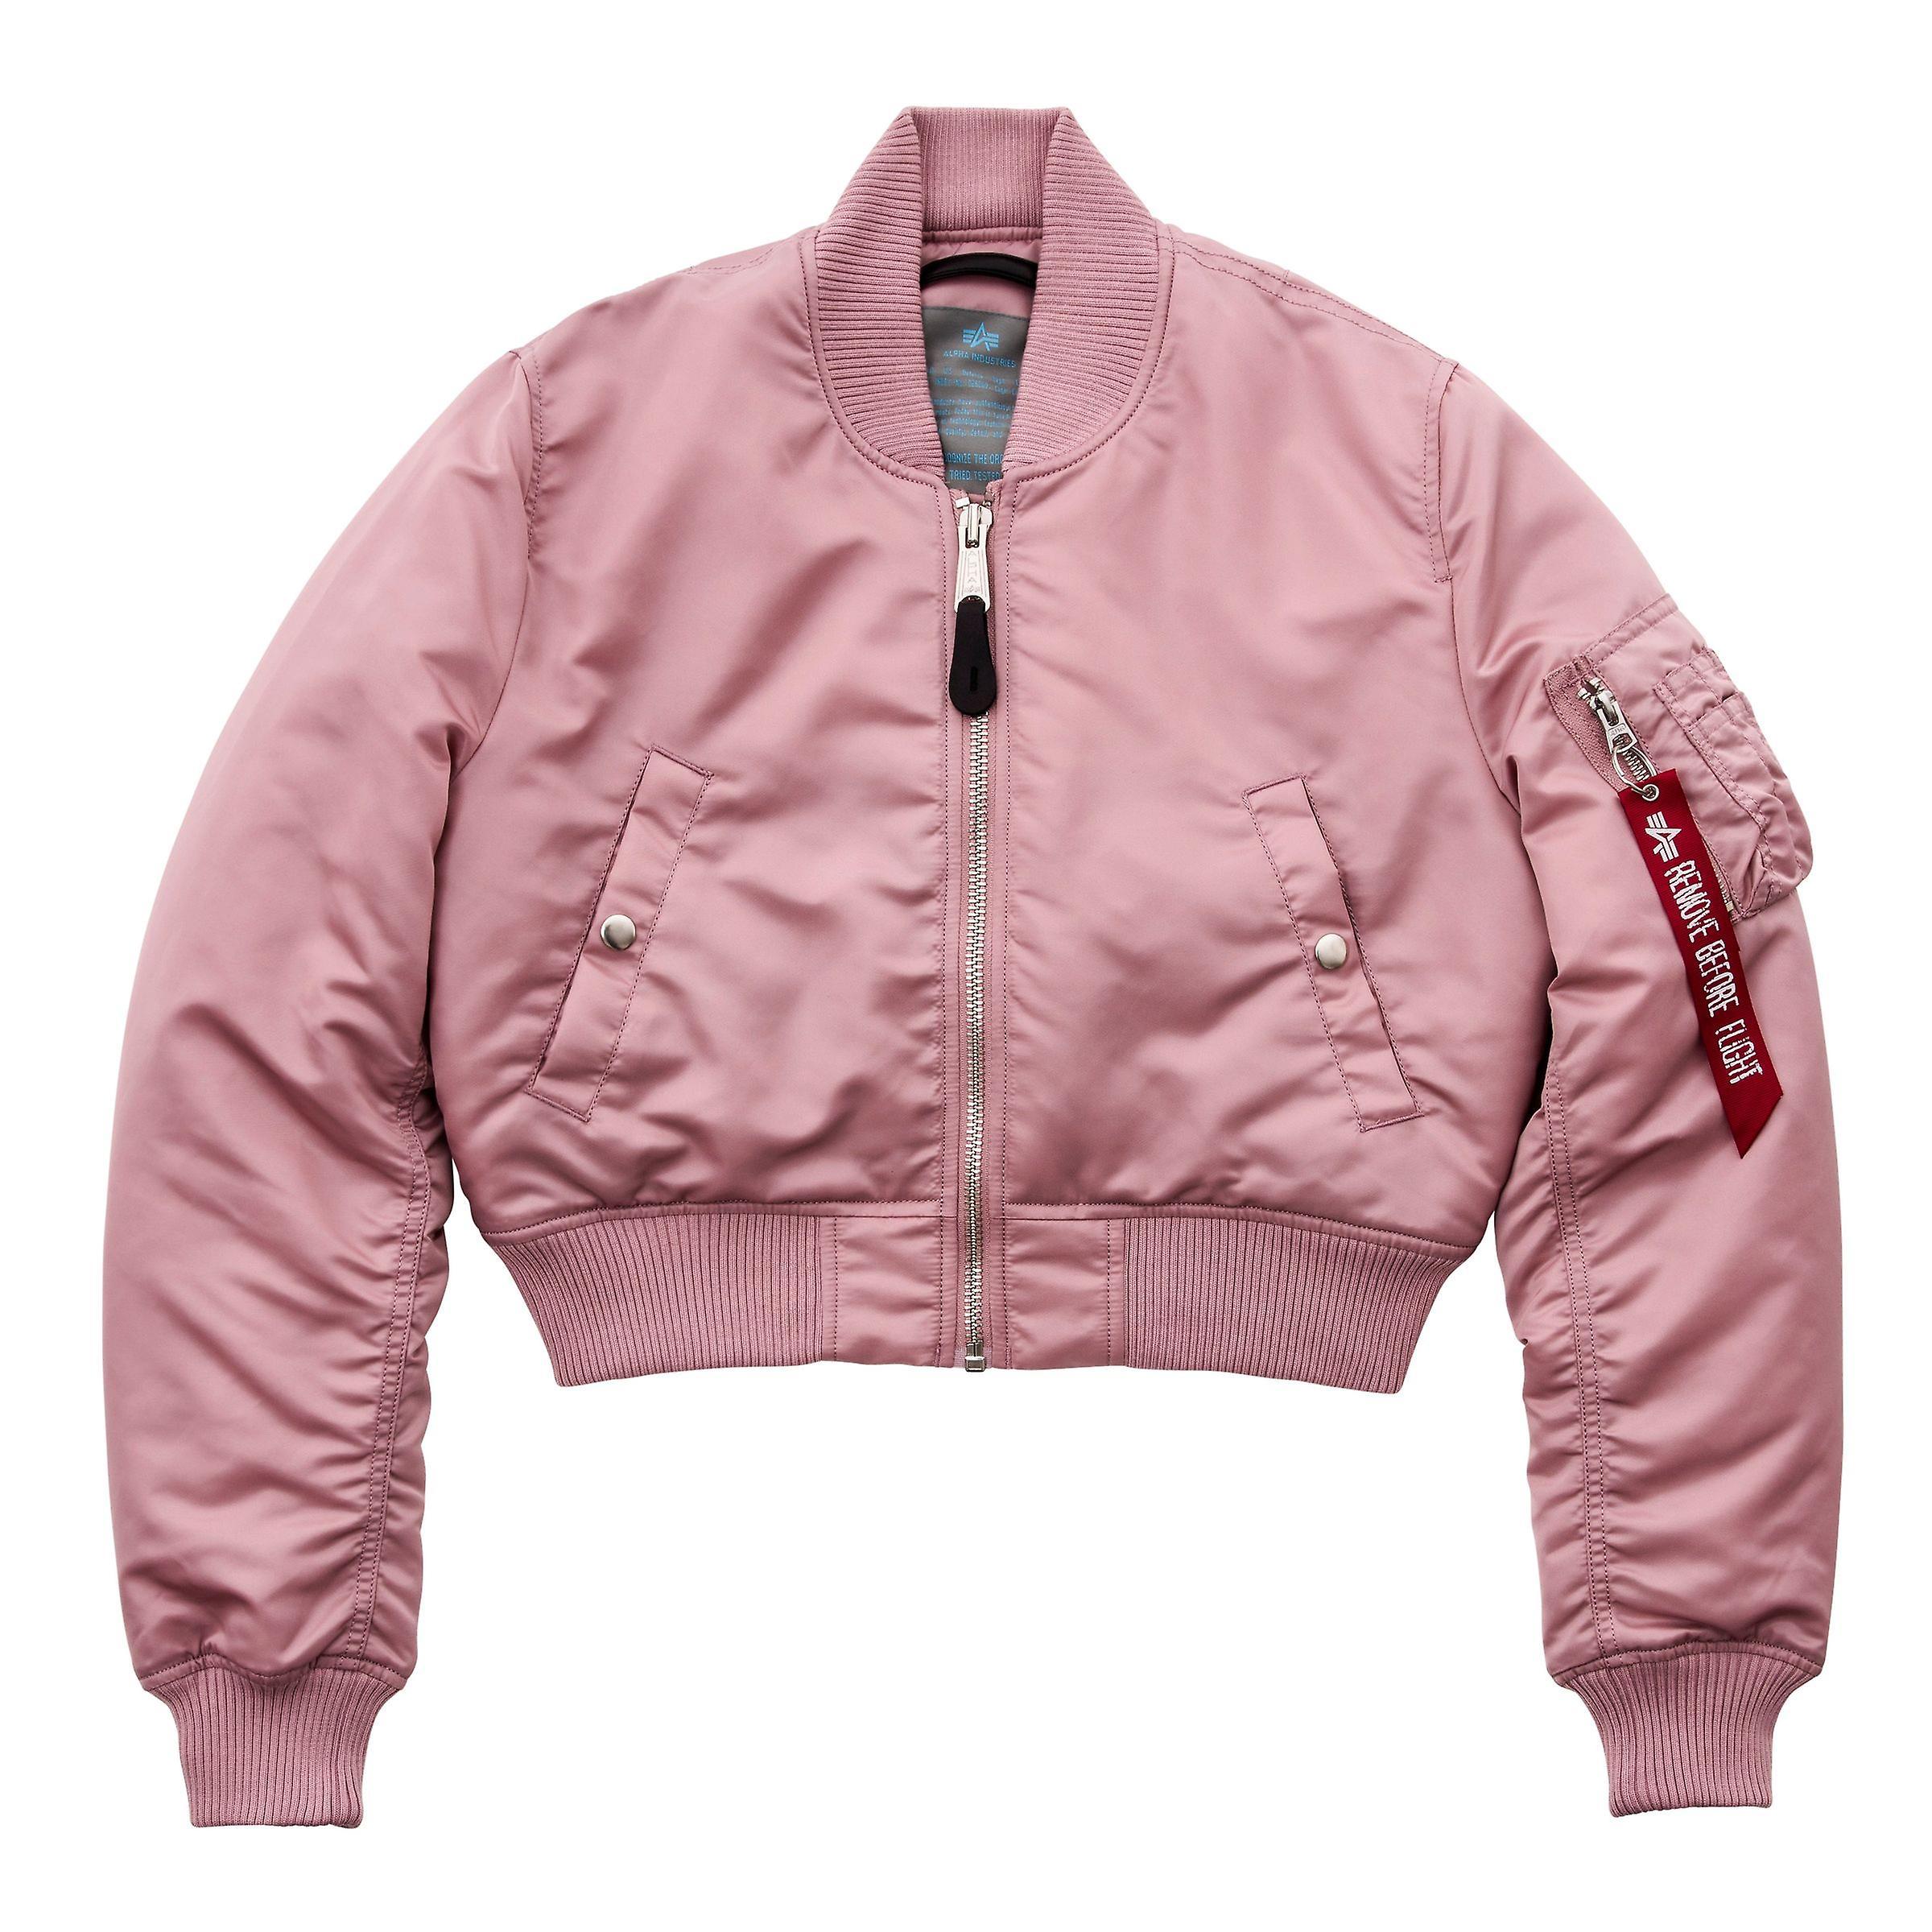 Alpha industries ladies jacket MA 1 SF PM cropped Wmn